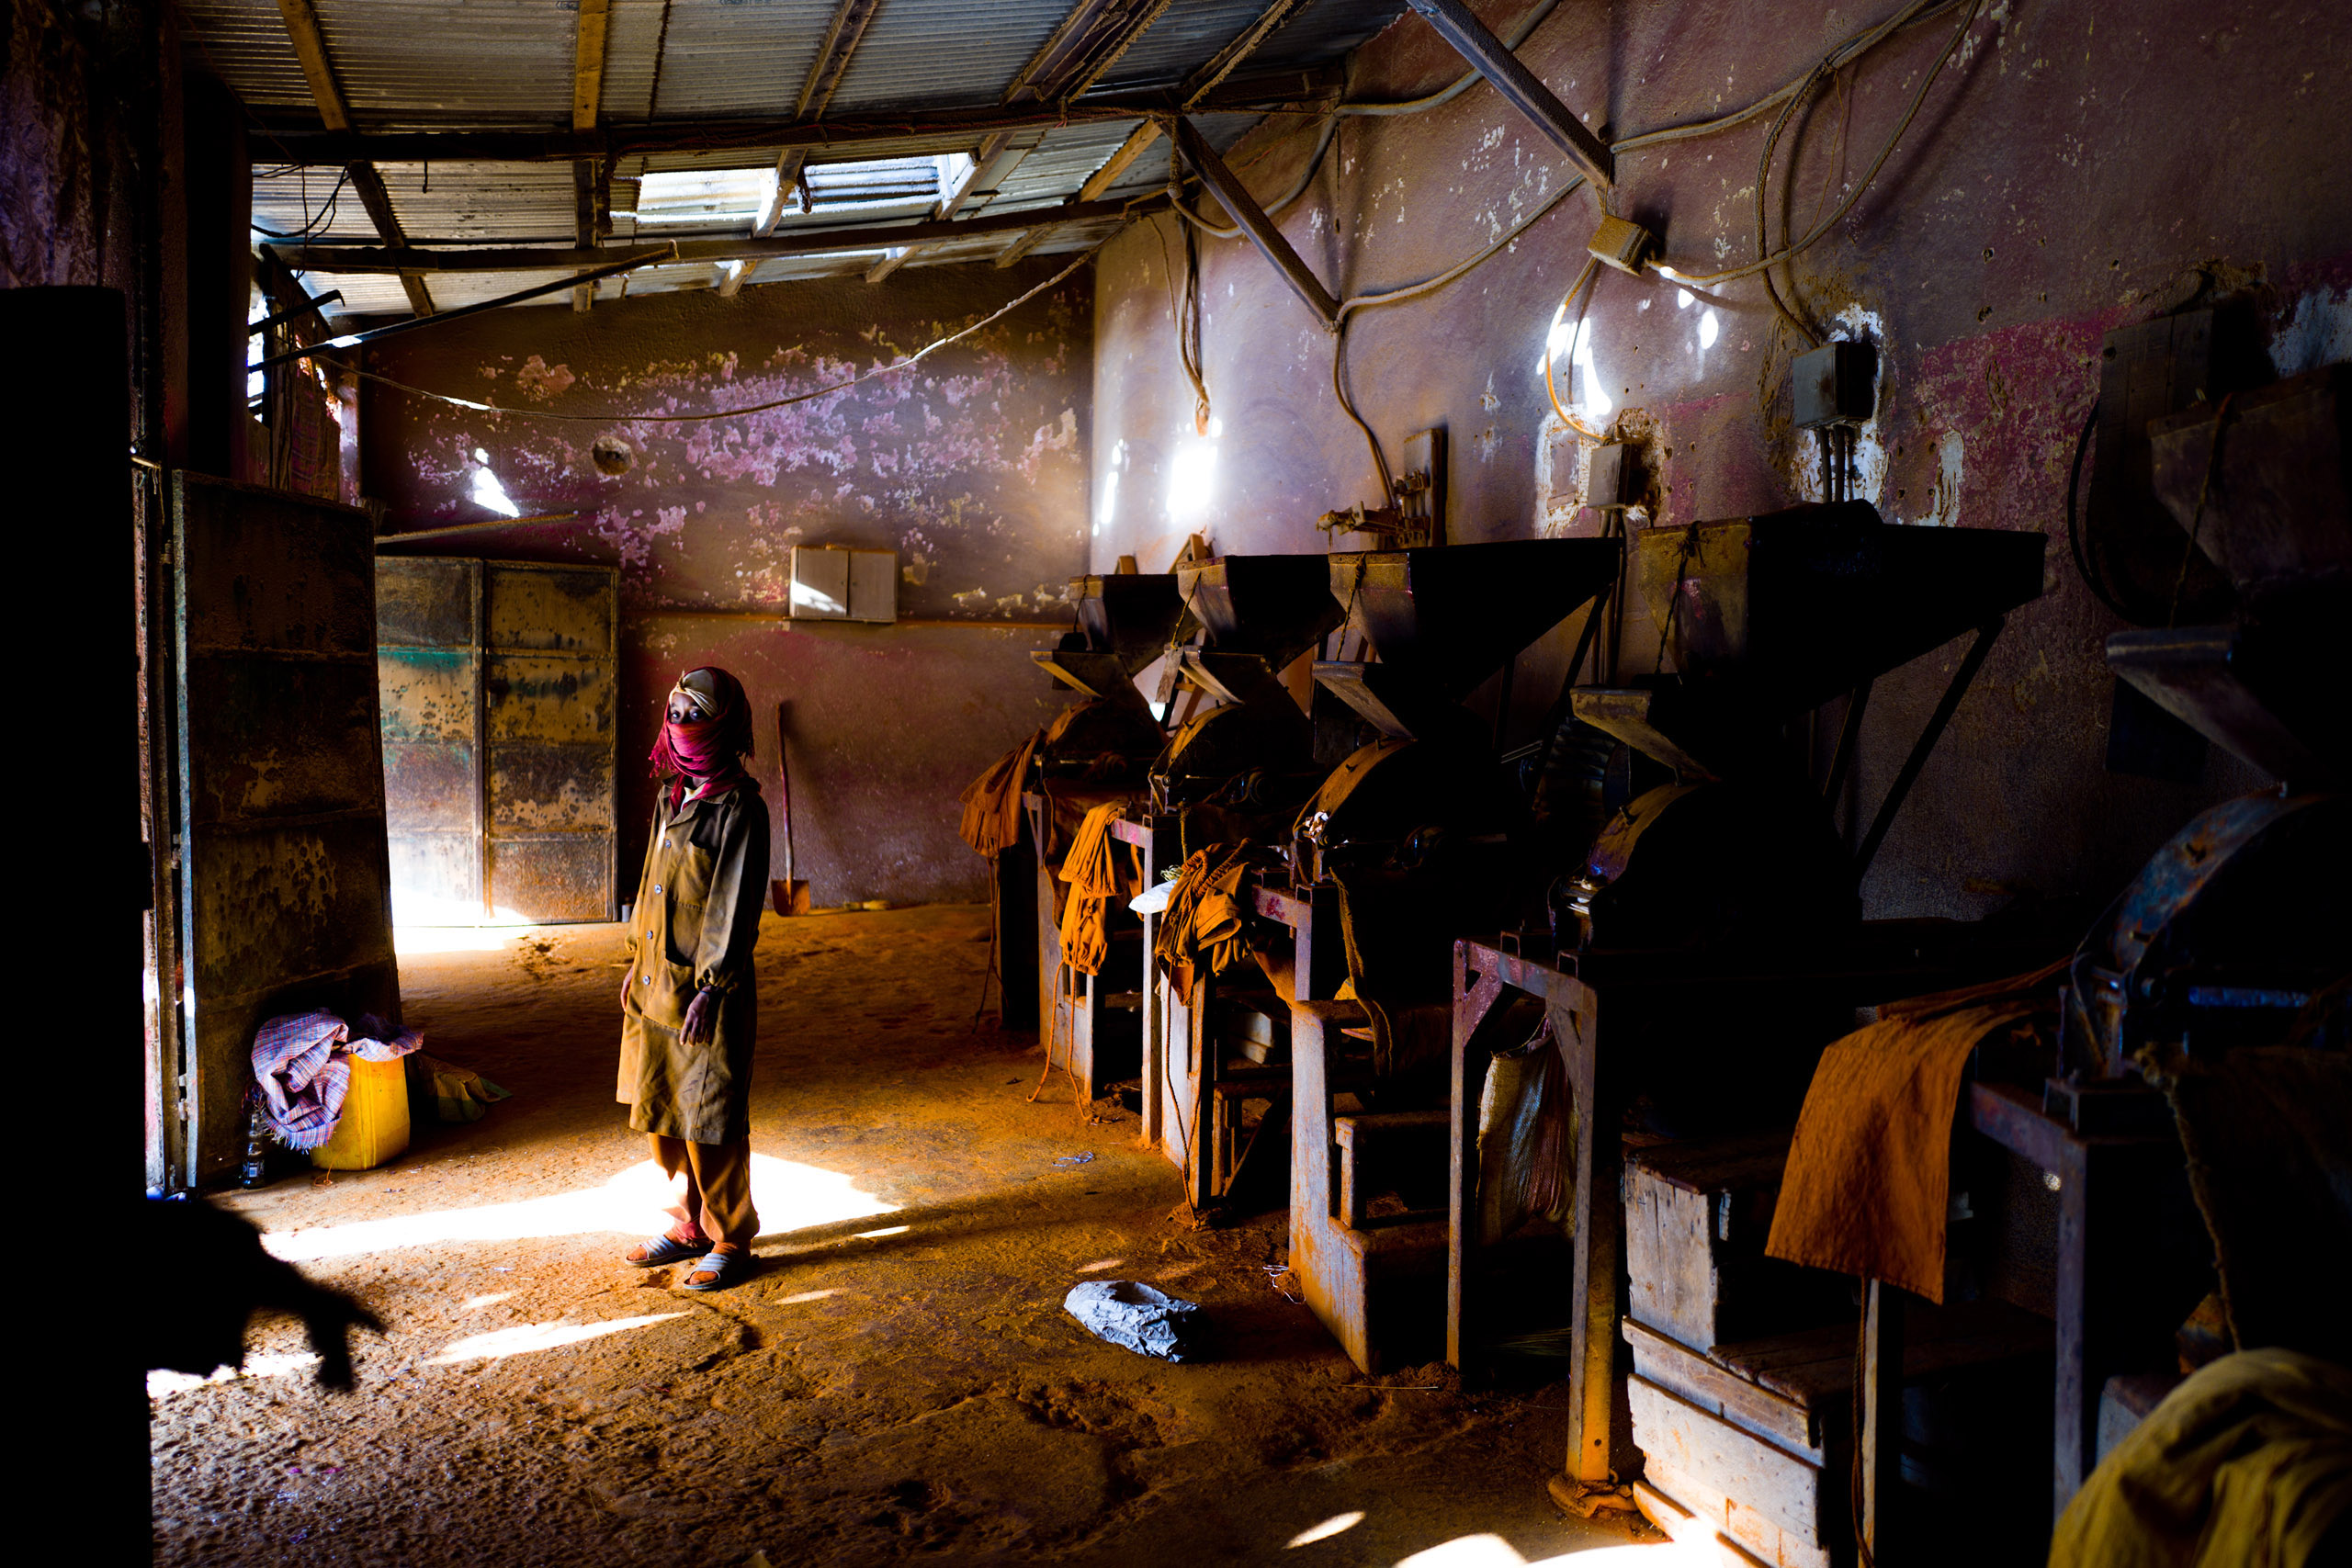 The berbere spice mixing market in Asmara.